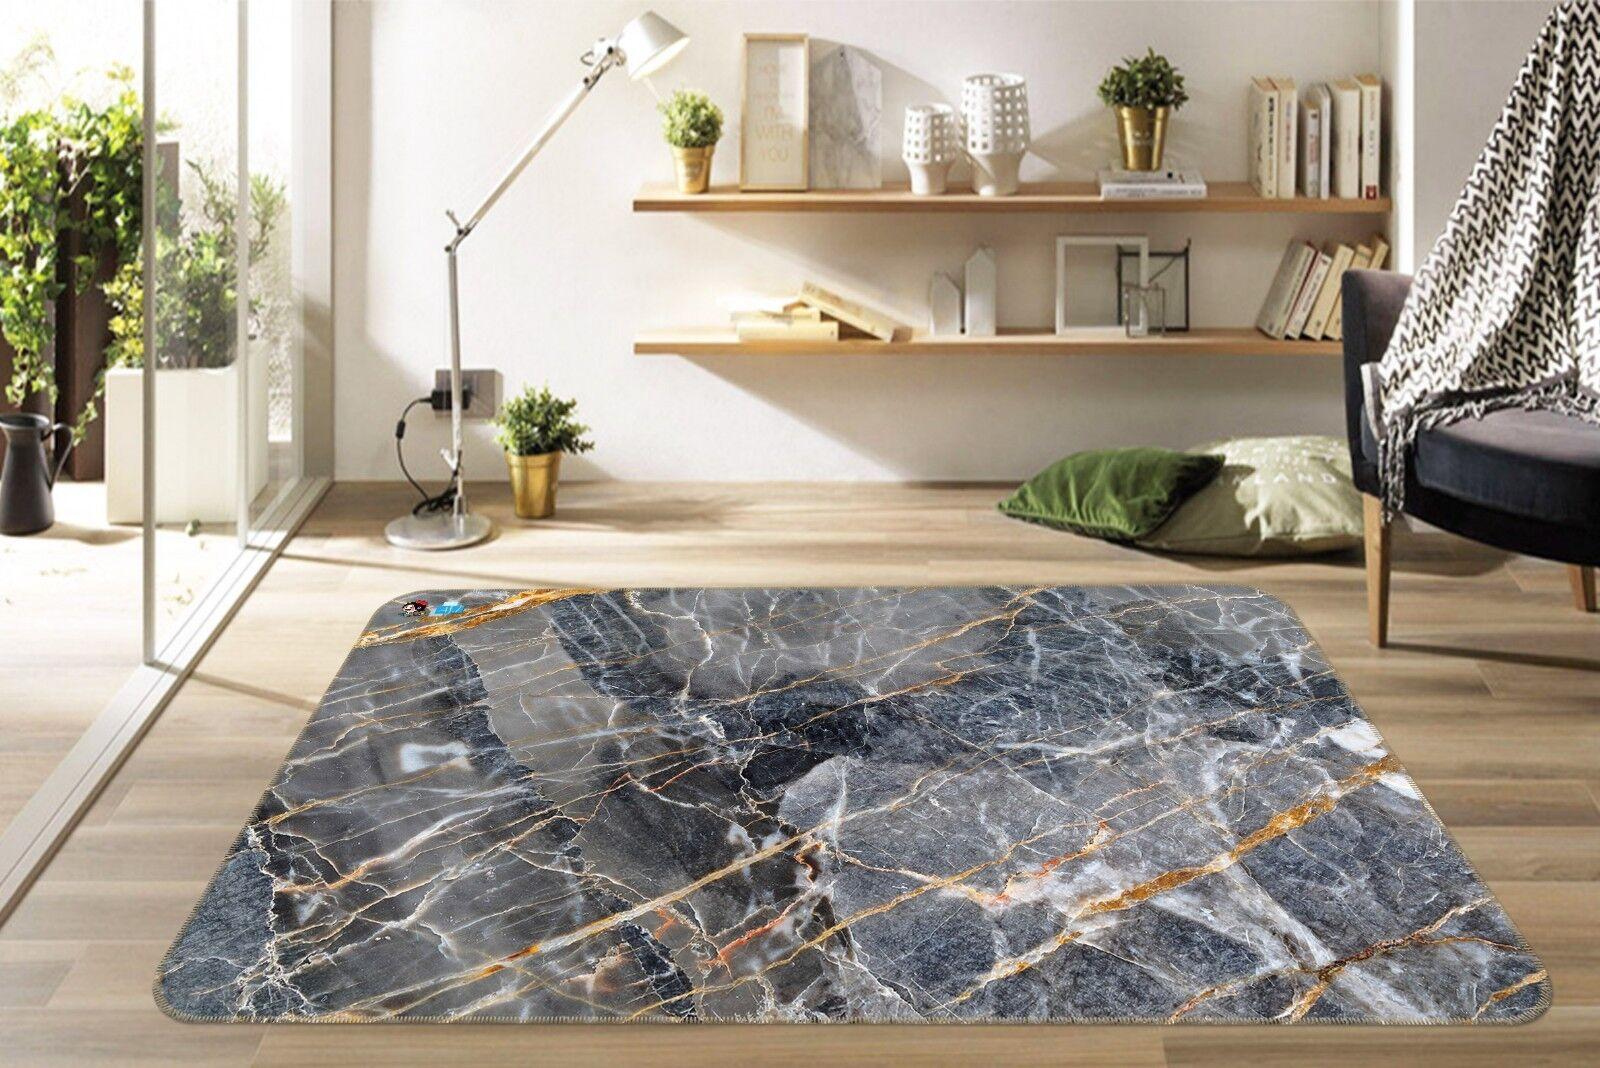 3D Marmor Textur Riss 2 Rutschfest Teppich Raum Raum Raum Matte Qualität Elegant Teppich fcb775